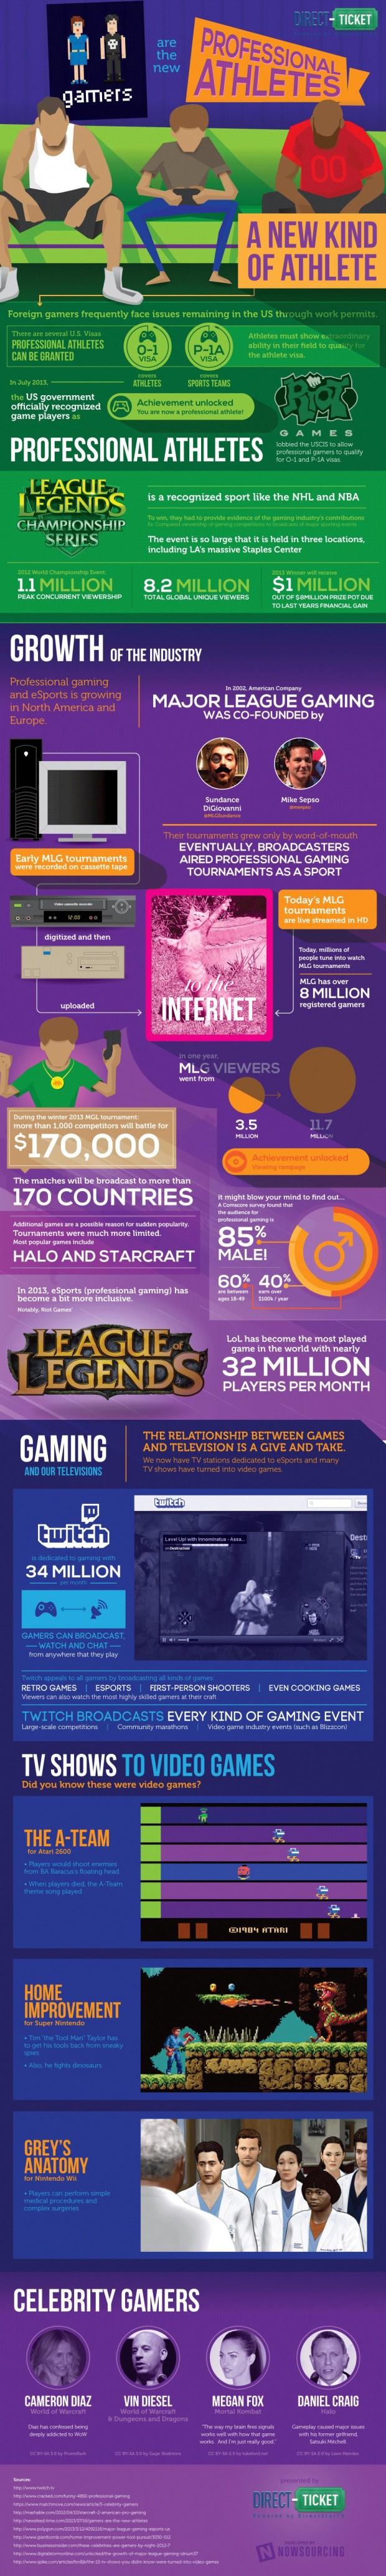 gamers-atheletes